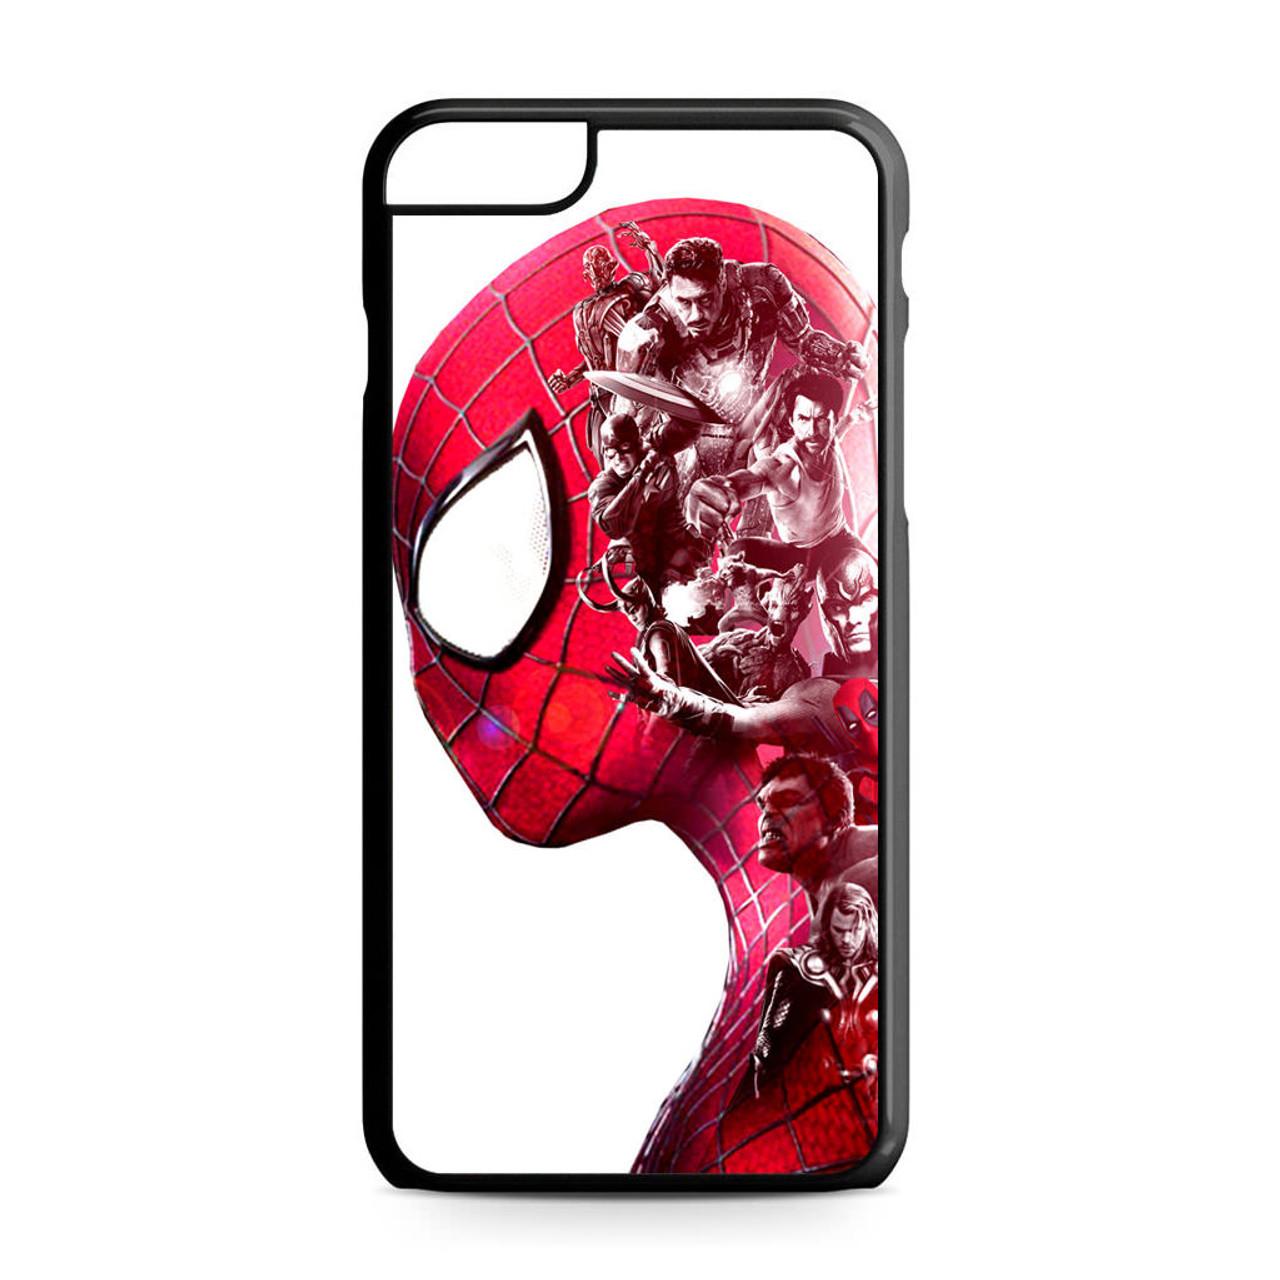 new product 5927b 1025b Spiderman Superheroes Marvel iPhone 6 Plus/6S Plus Case